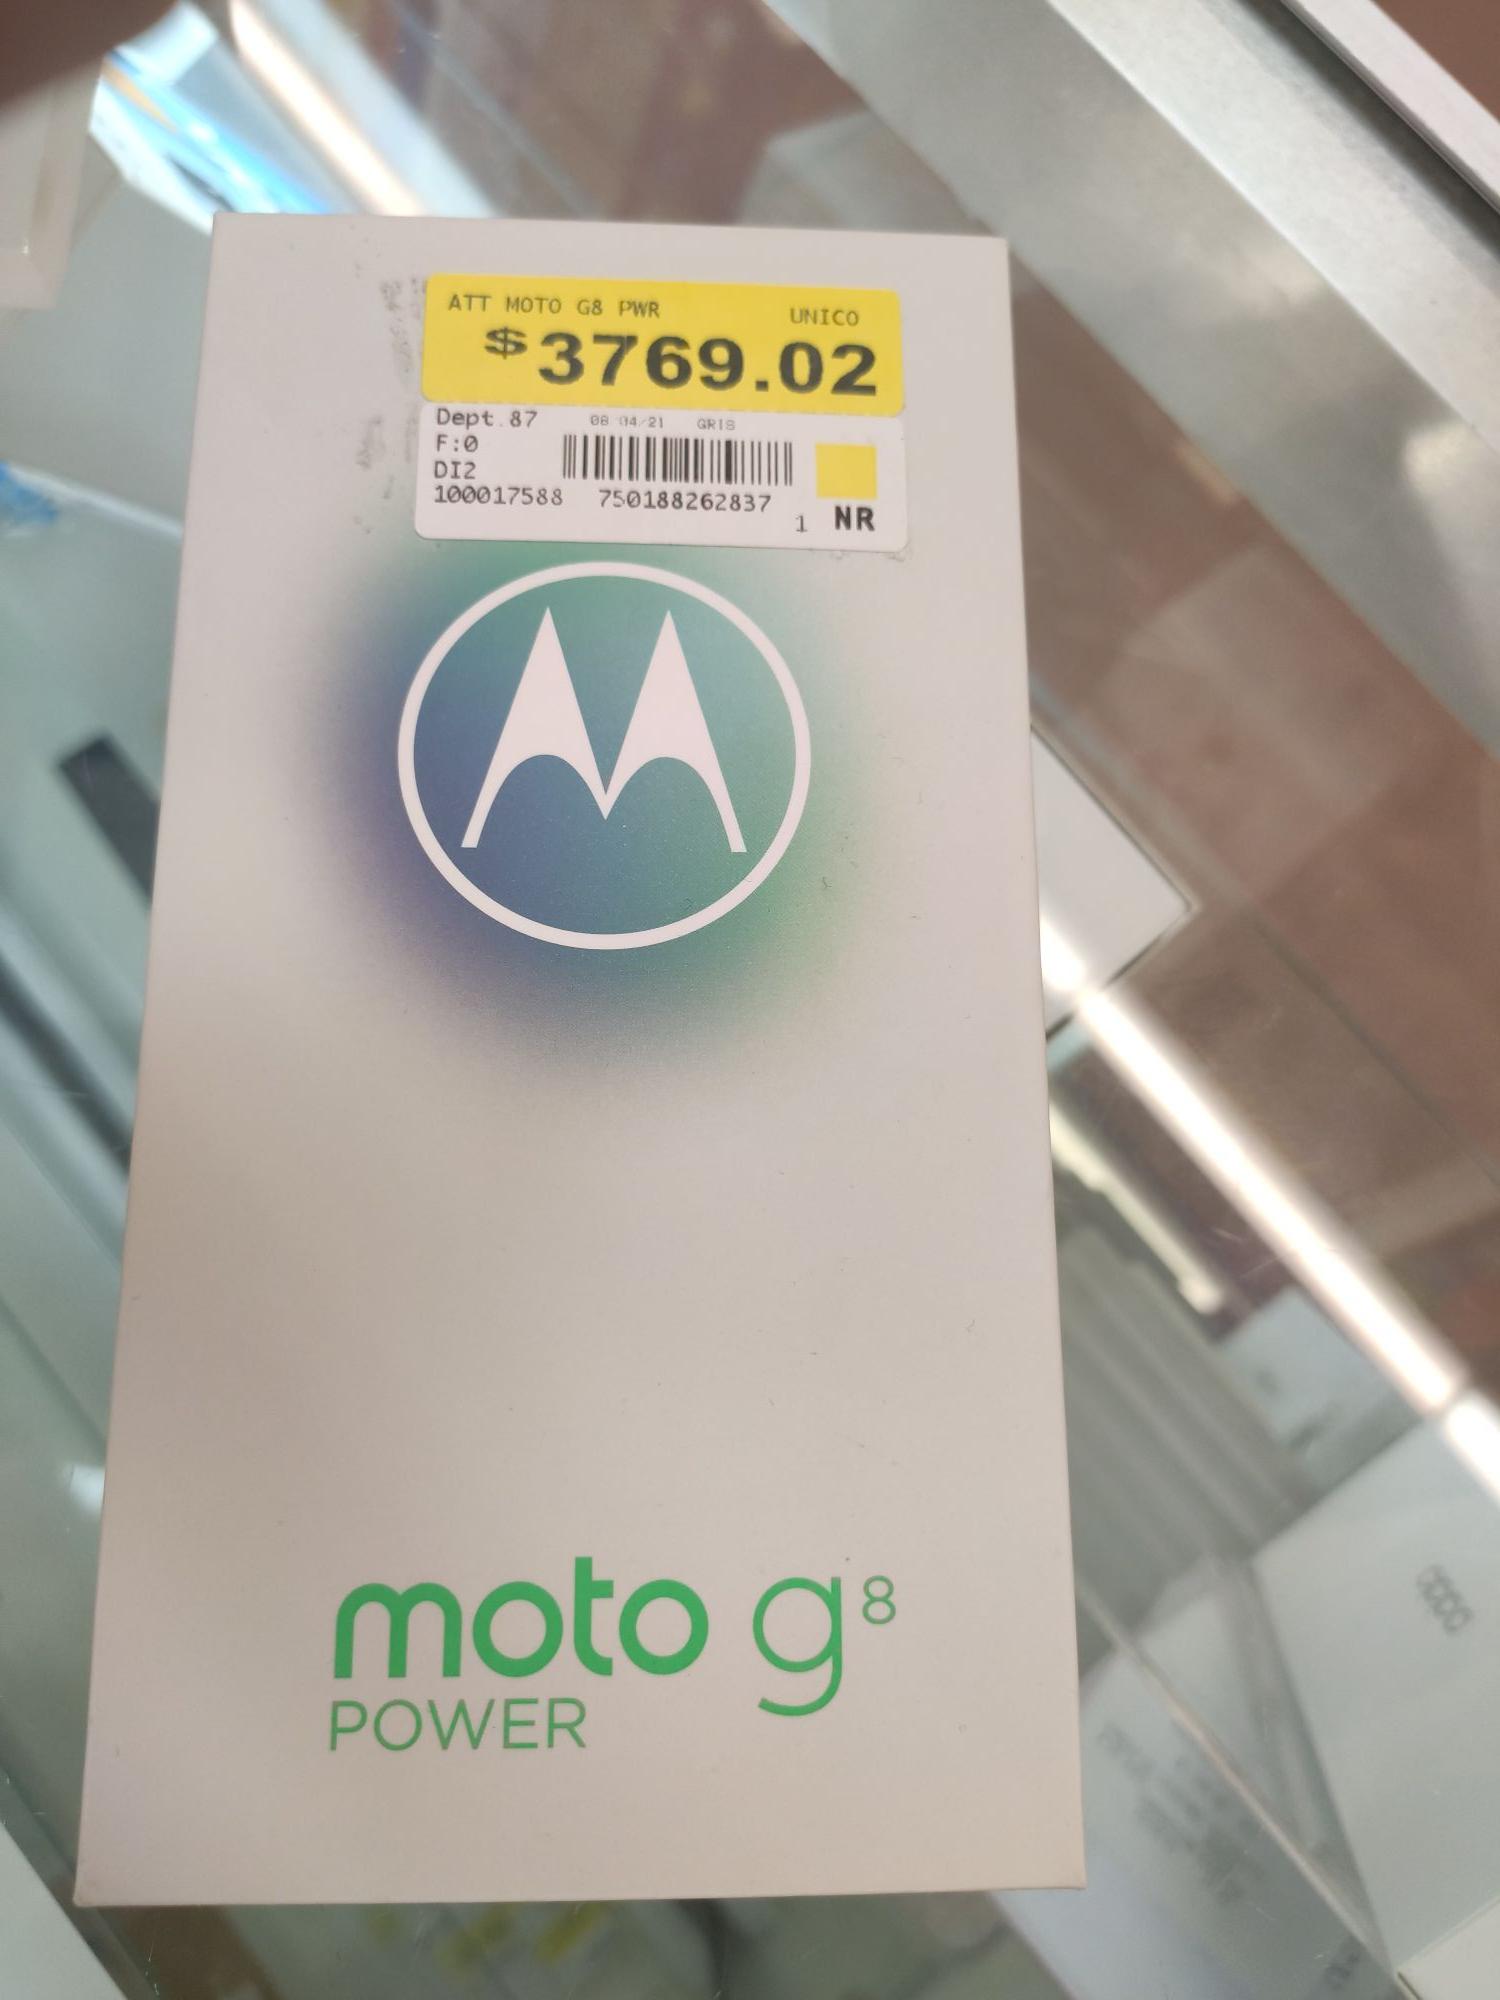 Segunda liquidación Motorola G8 Power Walmart-Coatzacoalcos